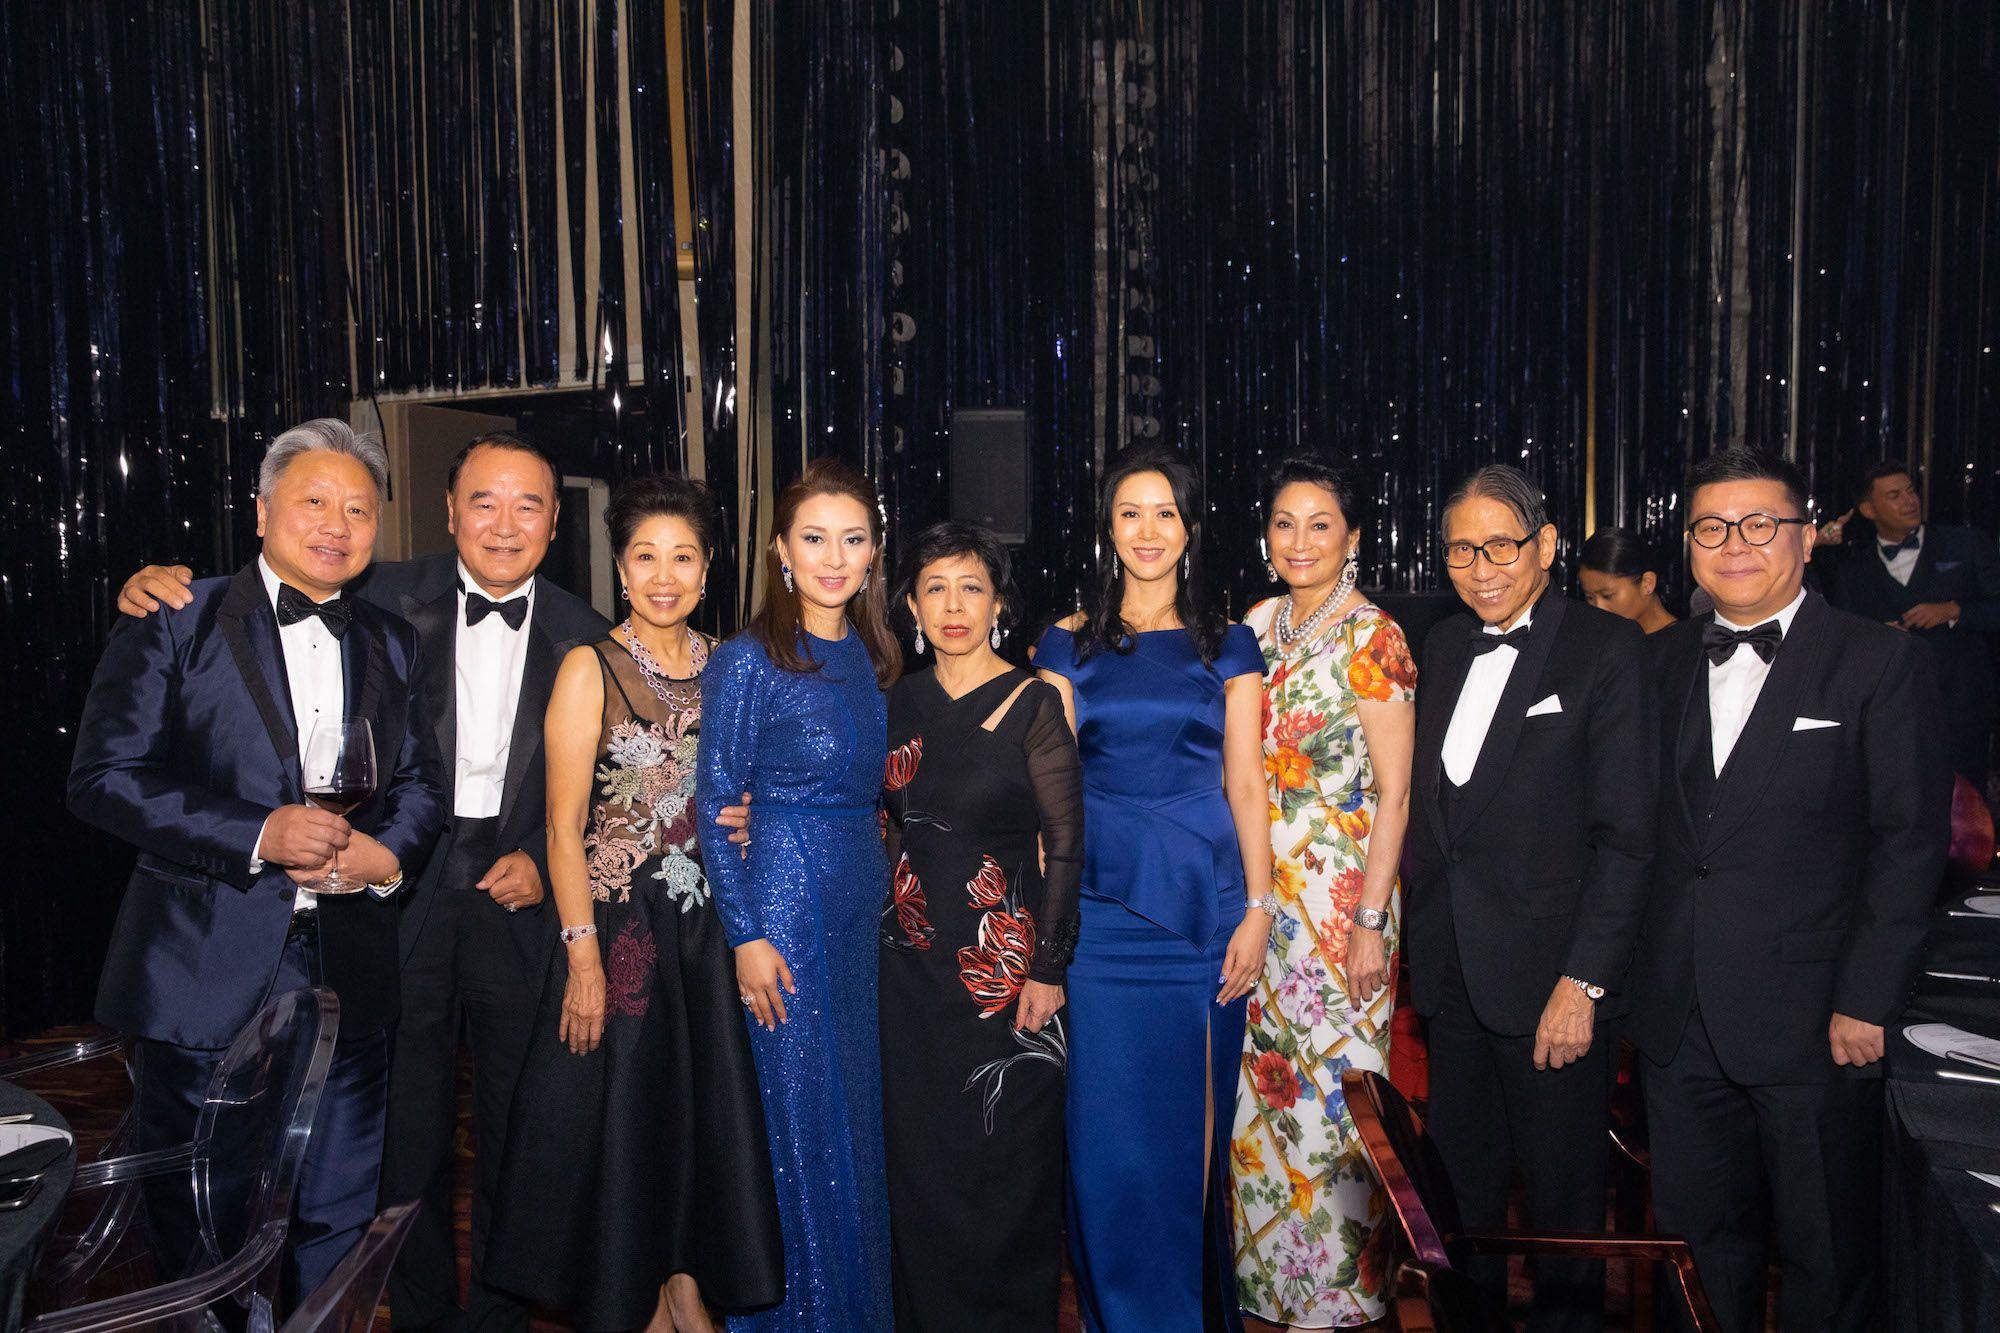 Jimmy Tang, Dennis Sun, Betty Sun, Emily Tang, Lilian Leong, Lianne Lam, Magdalena Lee, Che-Hung Leong, Matthew Lam